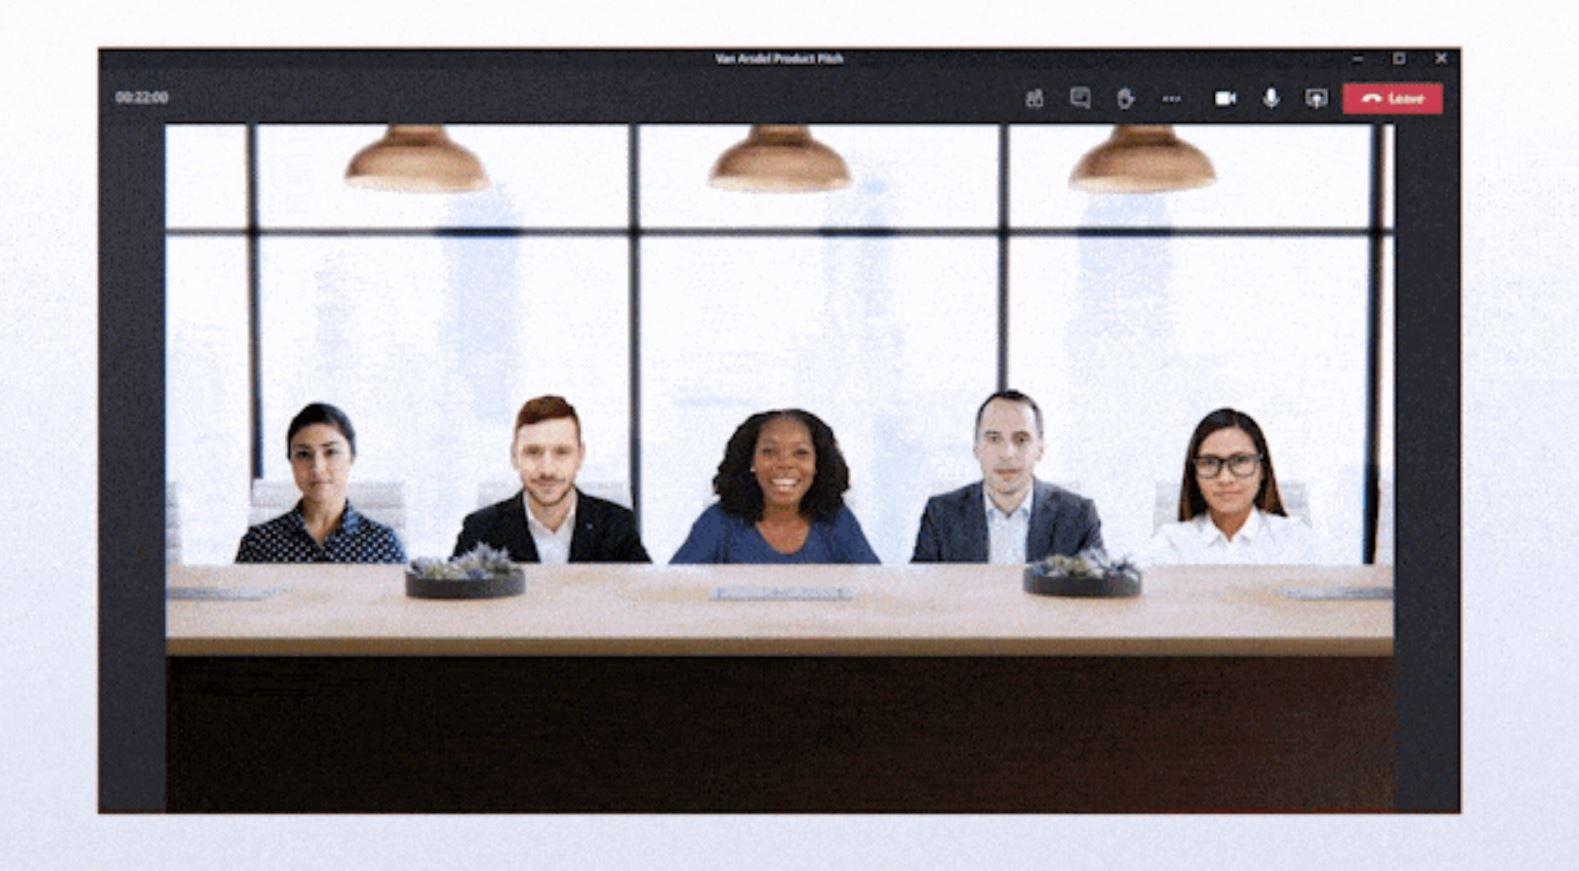 Microsoft Teams Together Mode